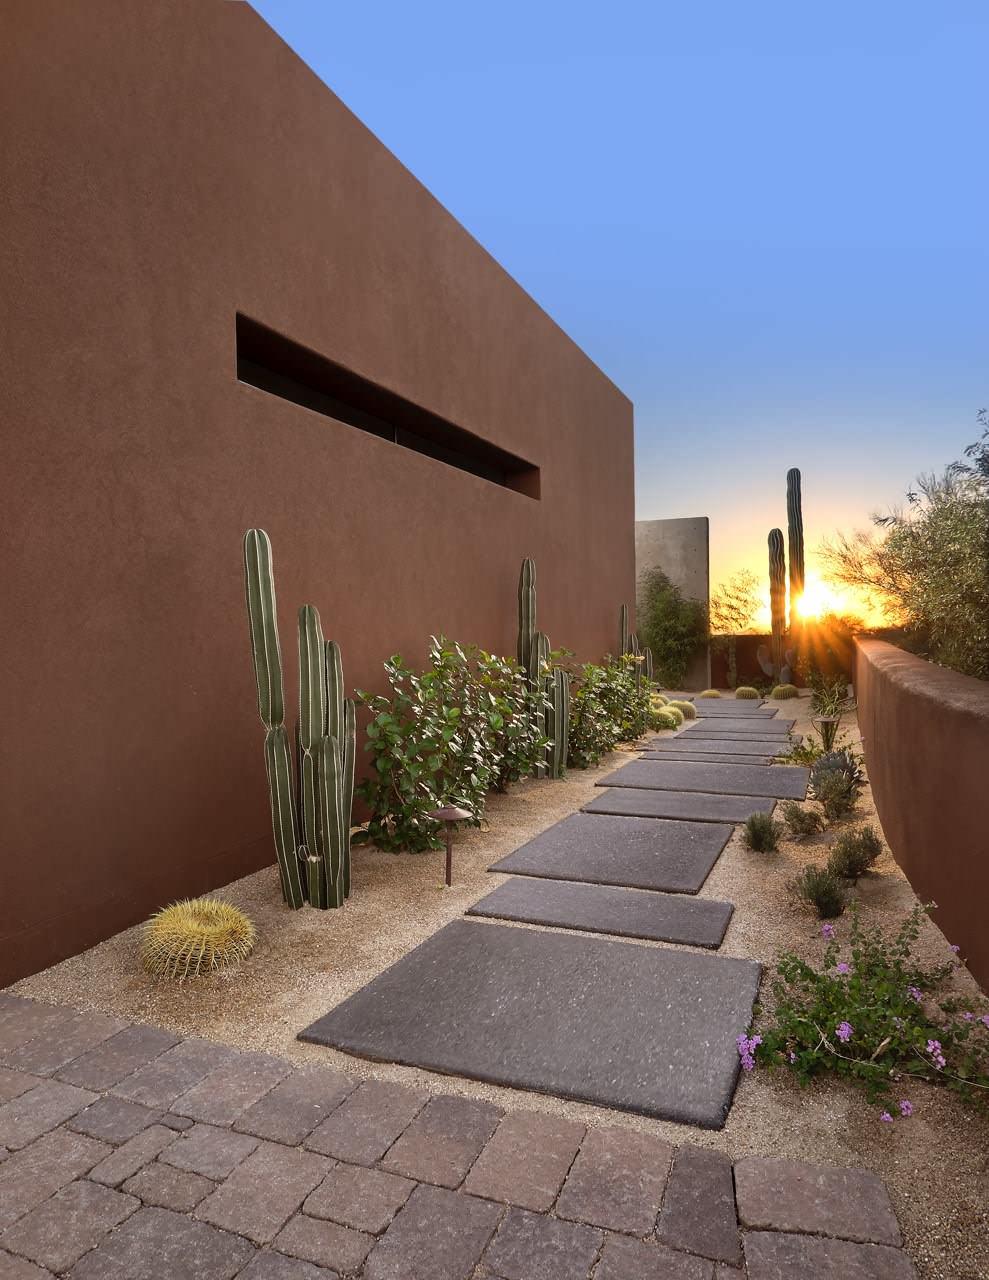 Kim Residence by Tate Studio Architects